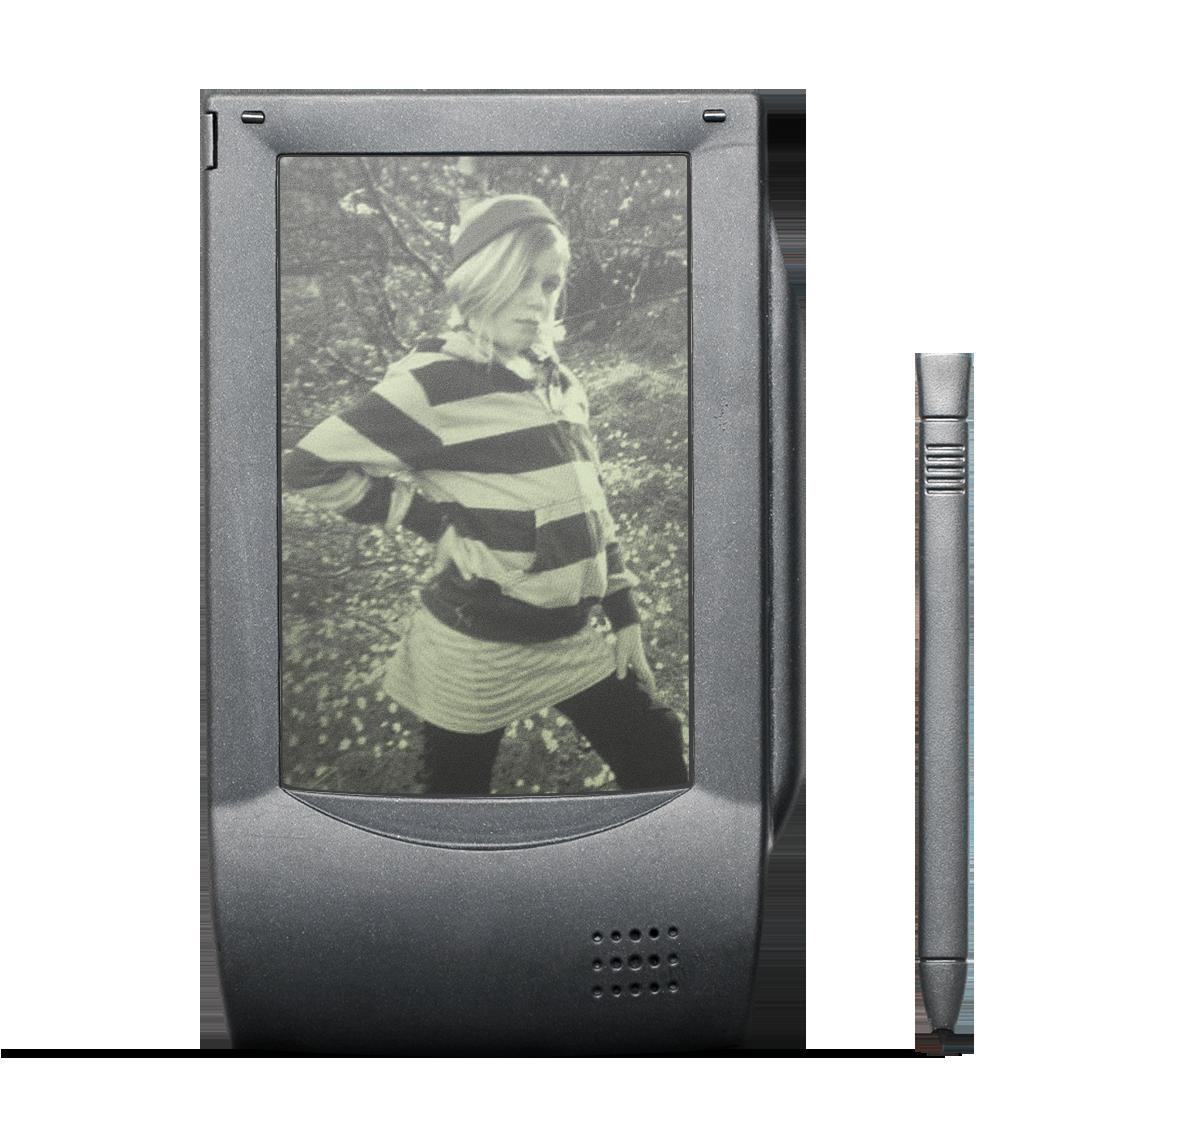 lovise_oldphone